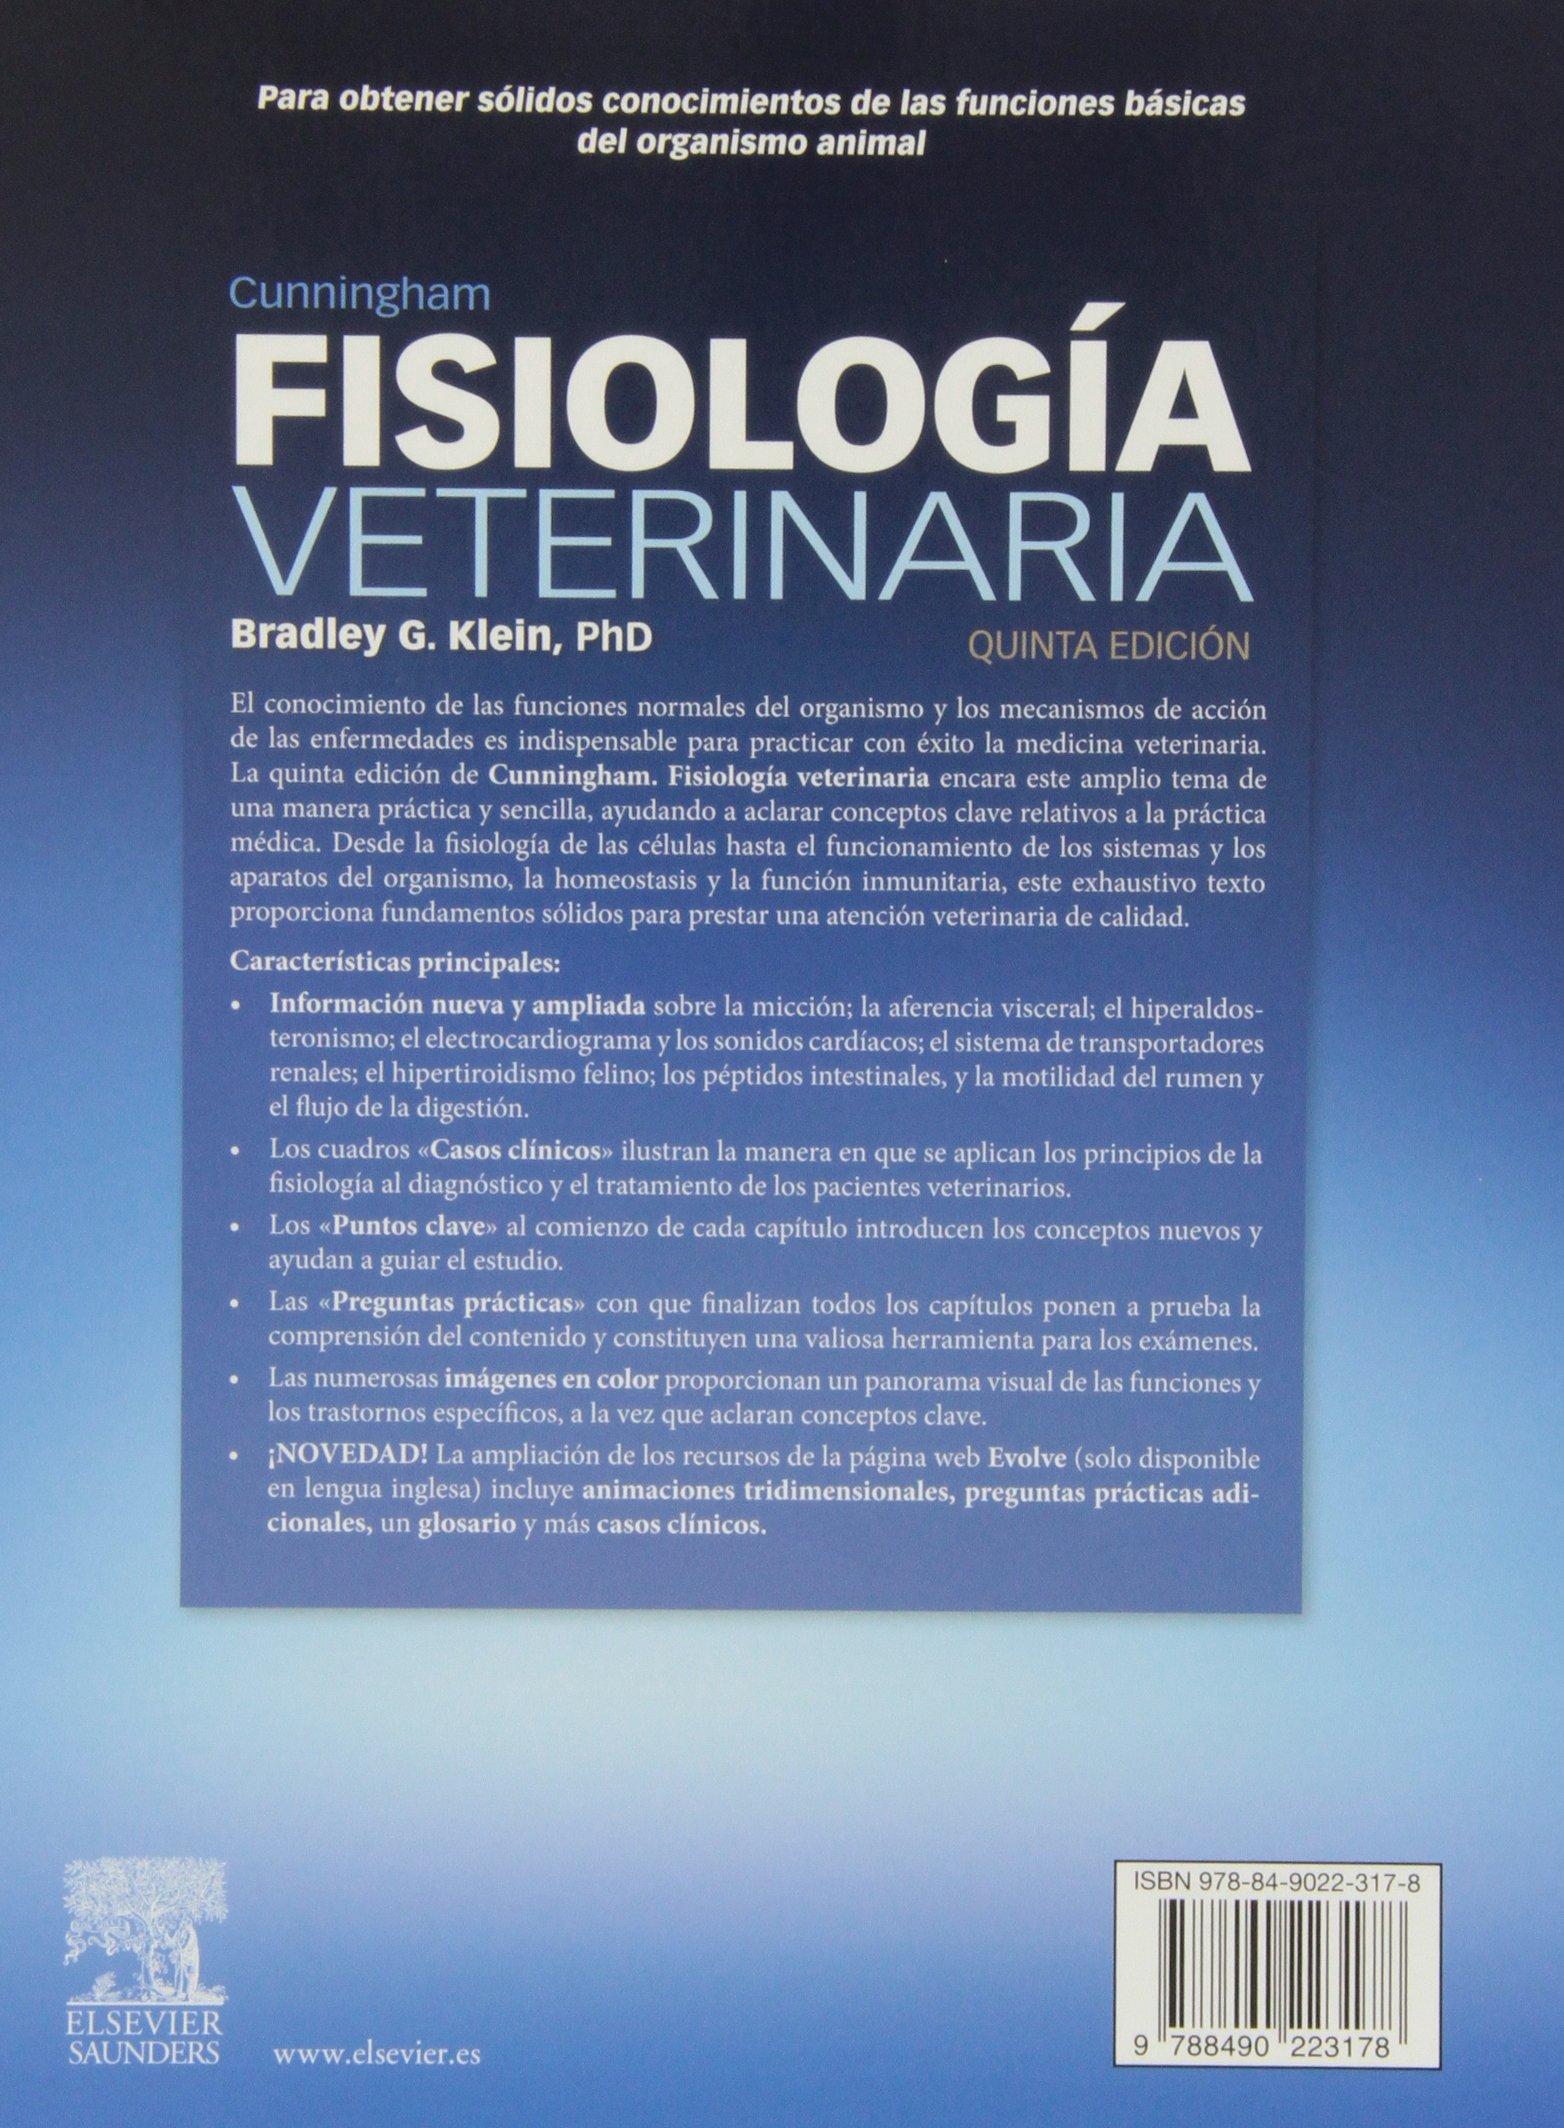 Cunningham Fisiología Veterinaria 5ª Ed Spanish Edition 9788490223178 Klein G B Books